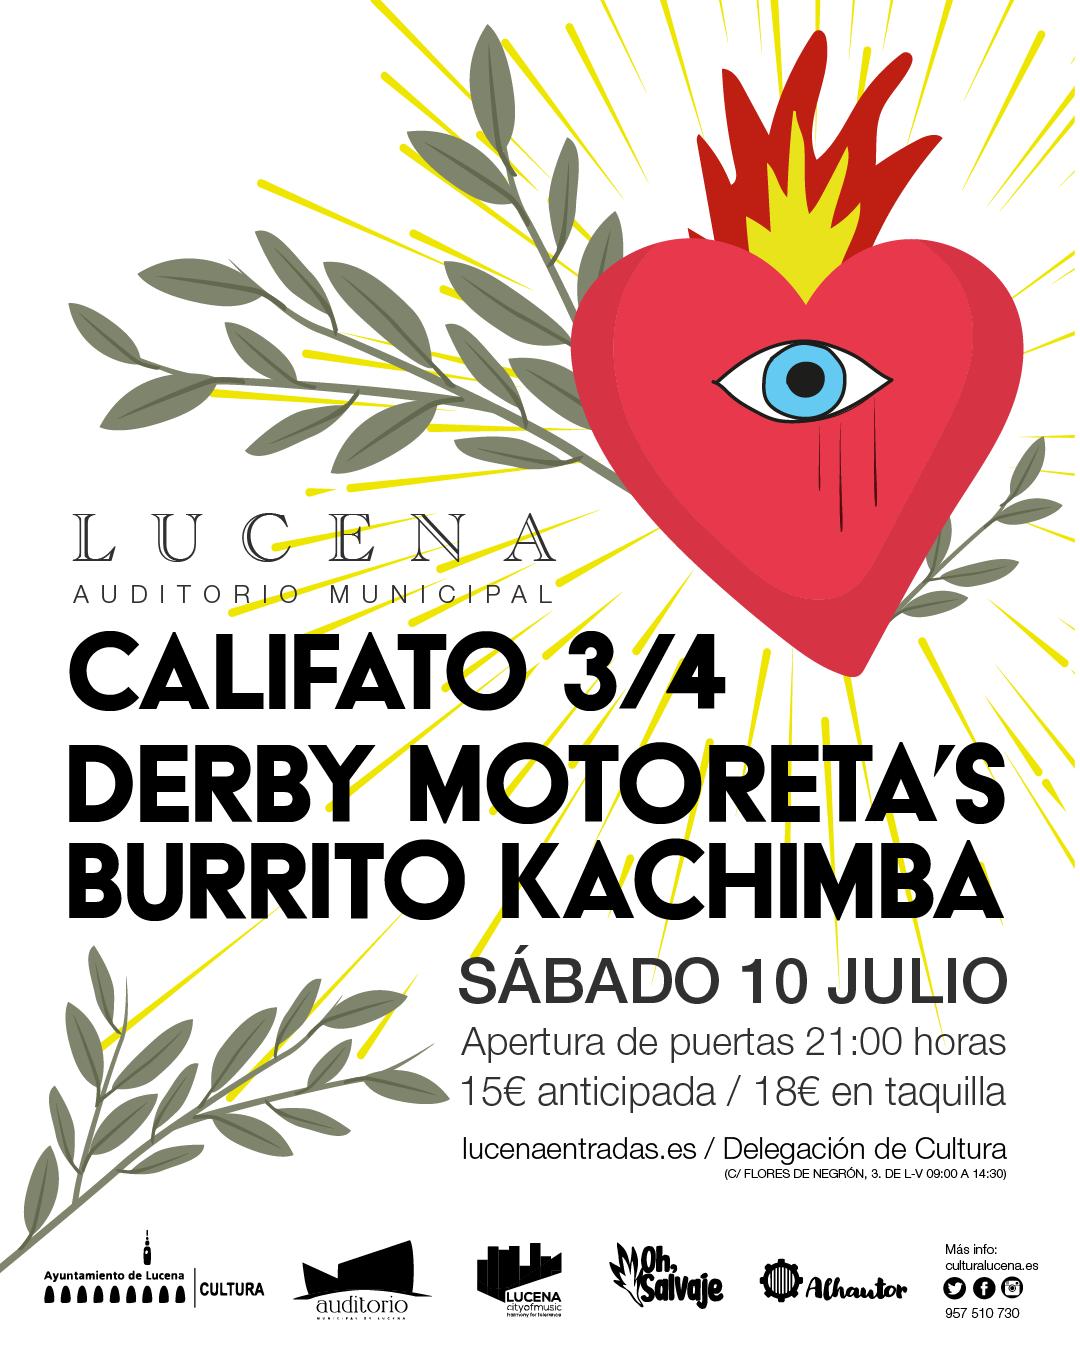 Califato Derby Motoreta Burrito Kachimba Oh Salvaje Lucena